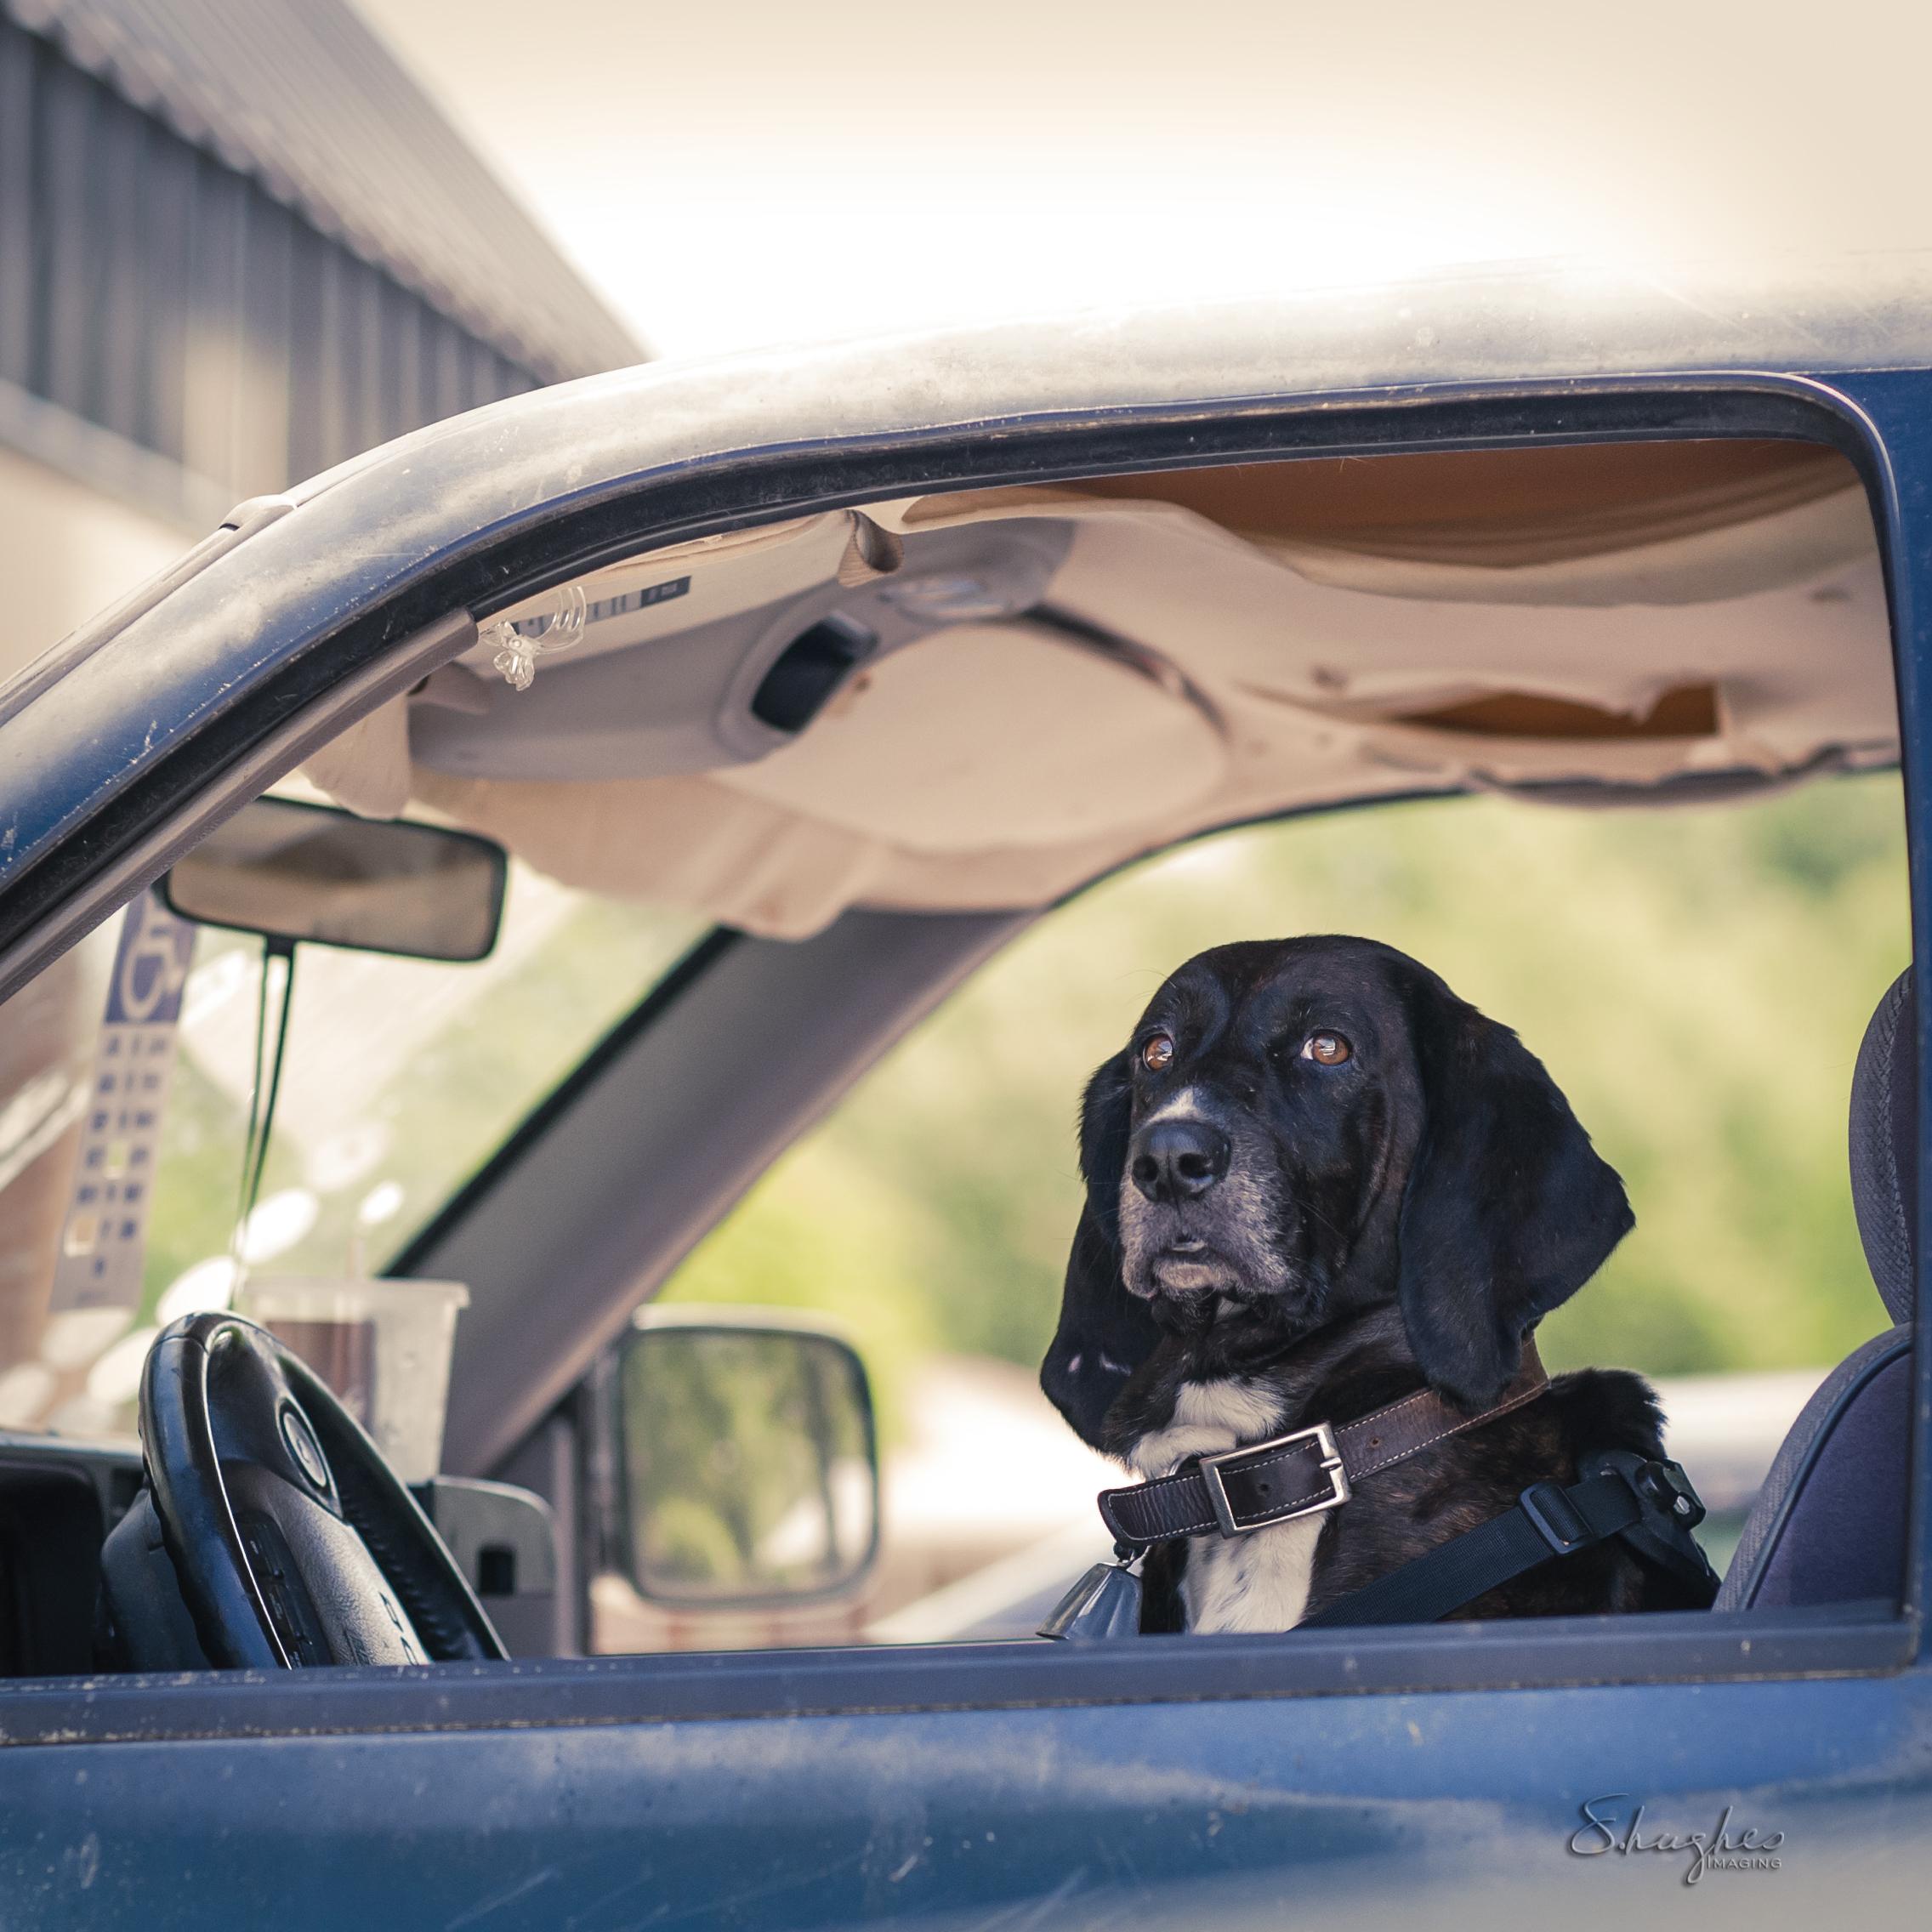 Random dog in a truck